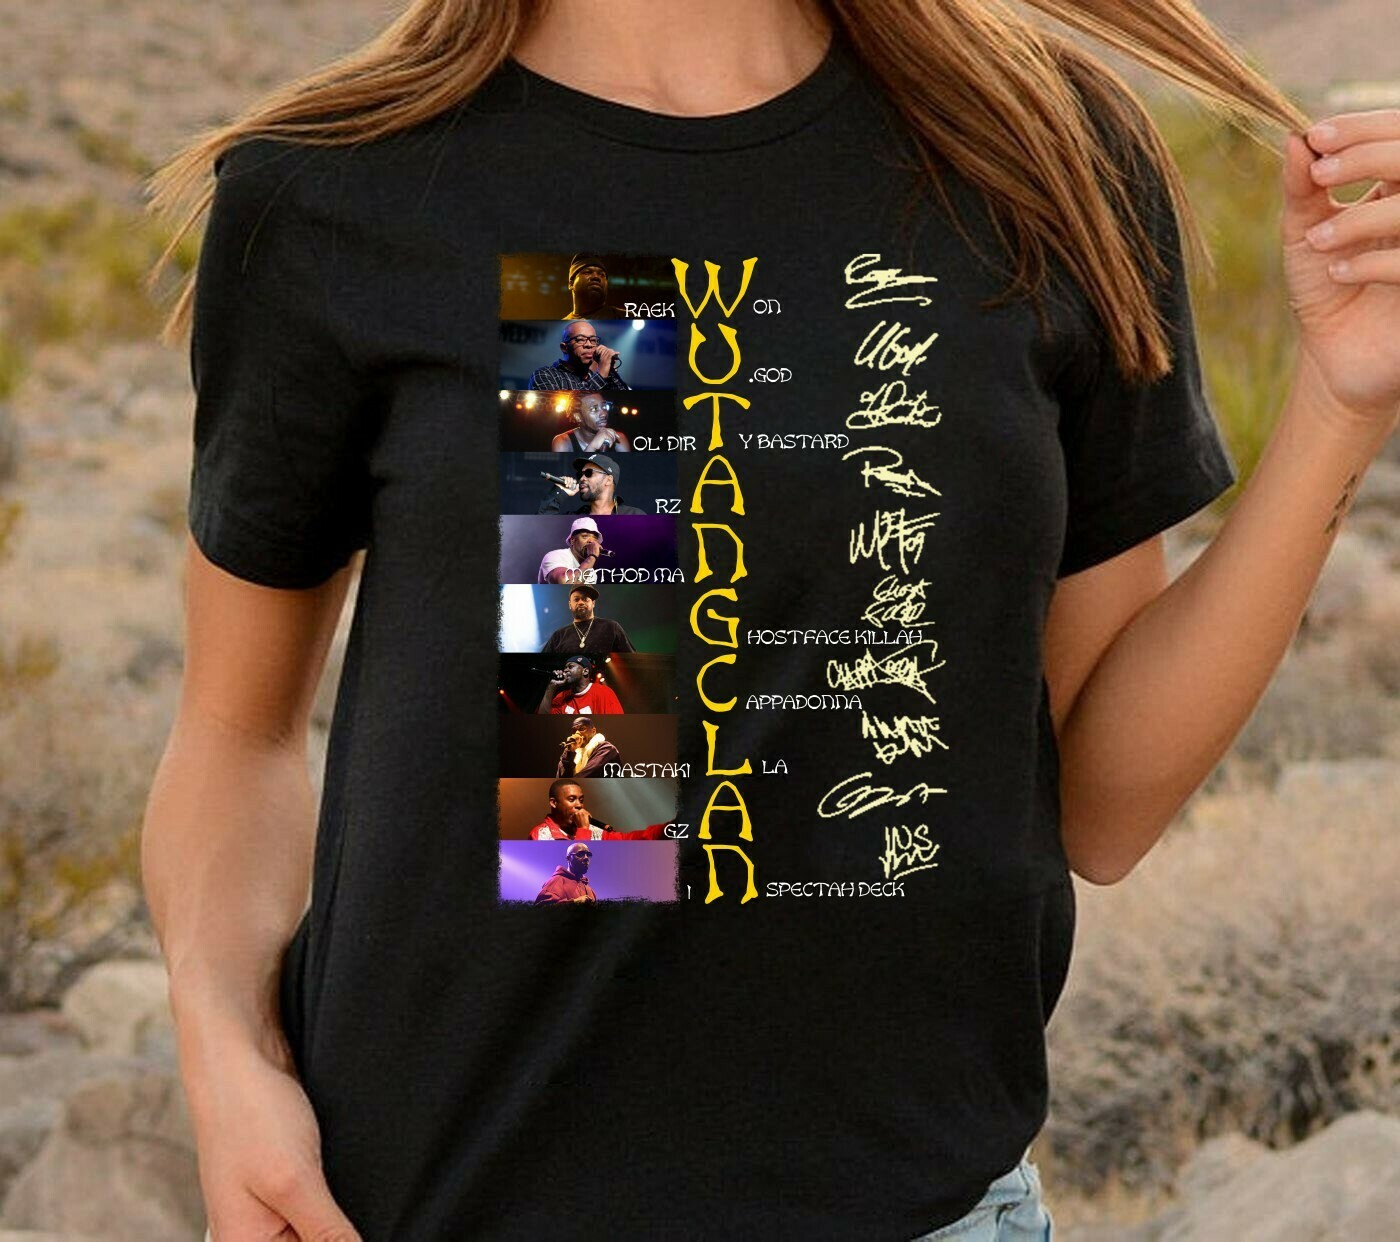 Wu Tang Clan Raekwon U God Oldir Ty Bastard Rza Methodman Signature,American hip hop group Fan,Wu Tang Clan Ice Cream Raekwon T-Shirt Long Sleeve Sweatshirt Hoodie Jolly Family Gifts